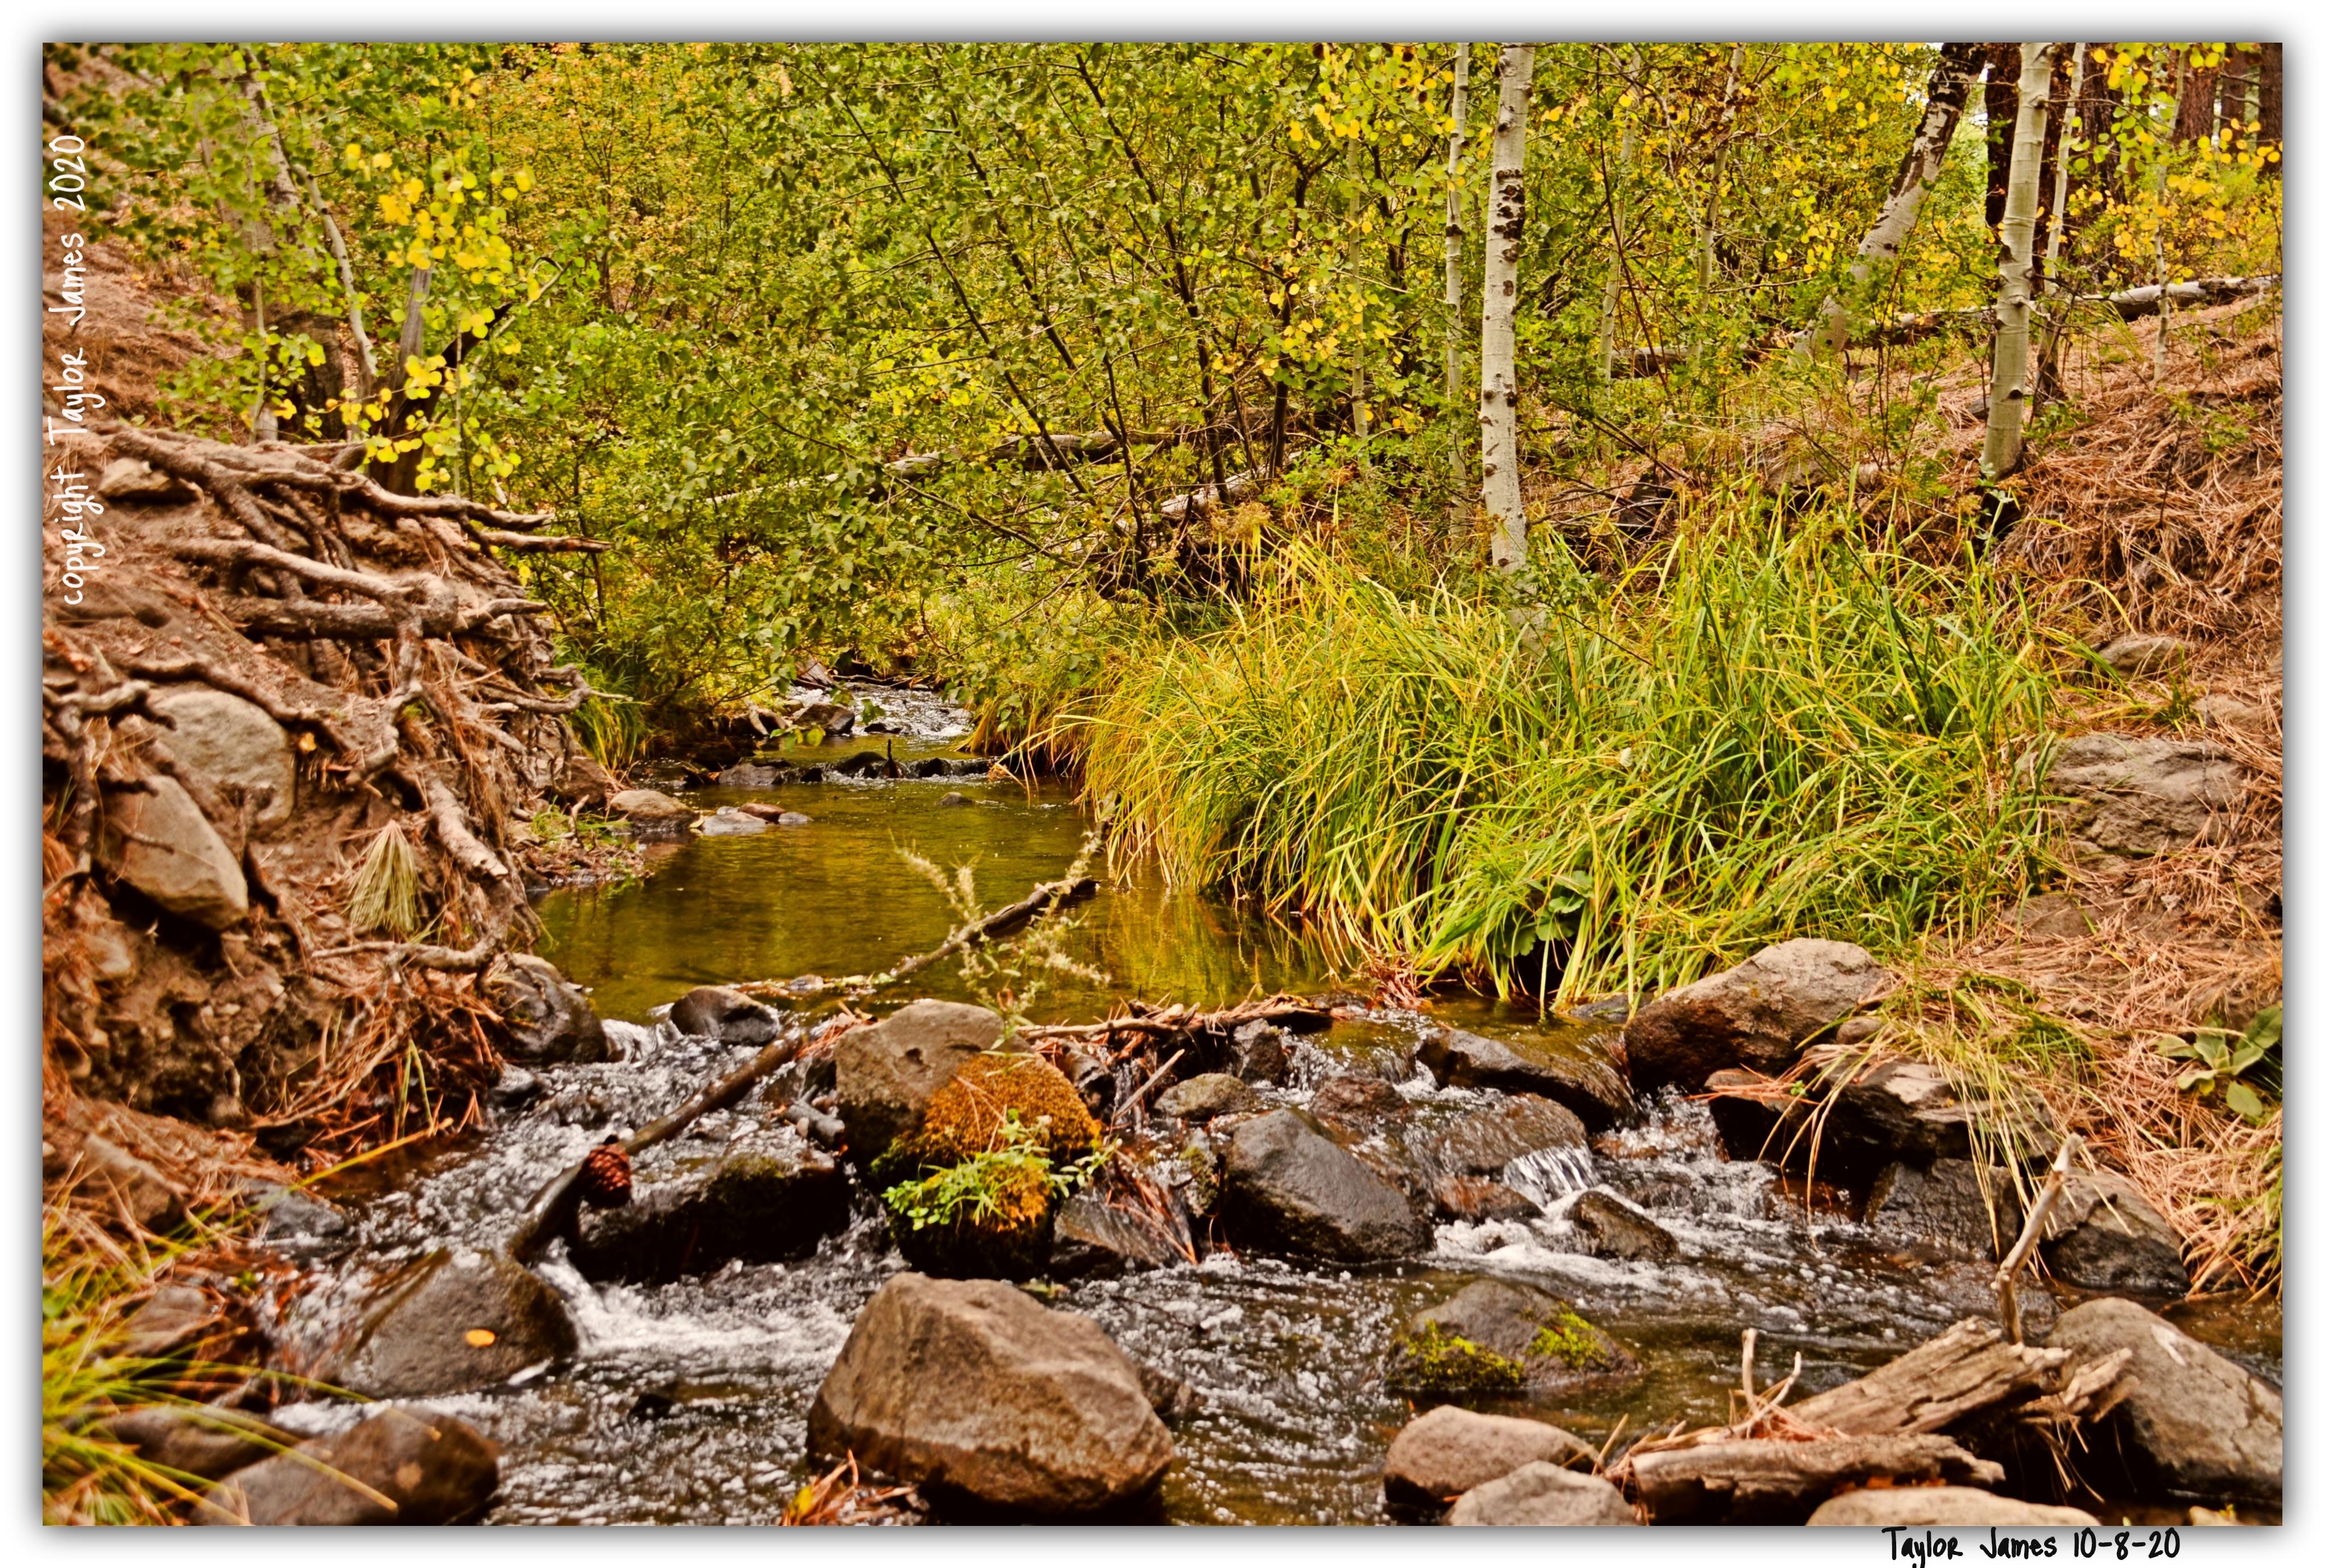 Taylor James- Thomas Creek